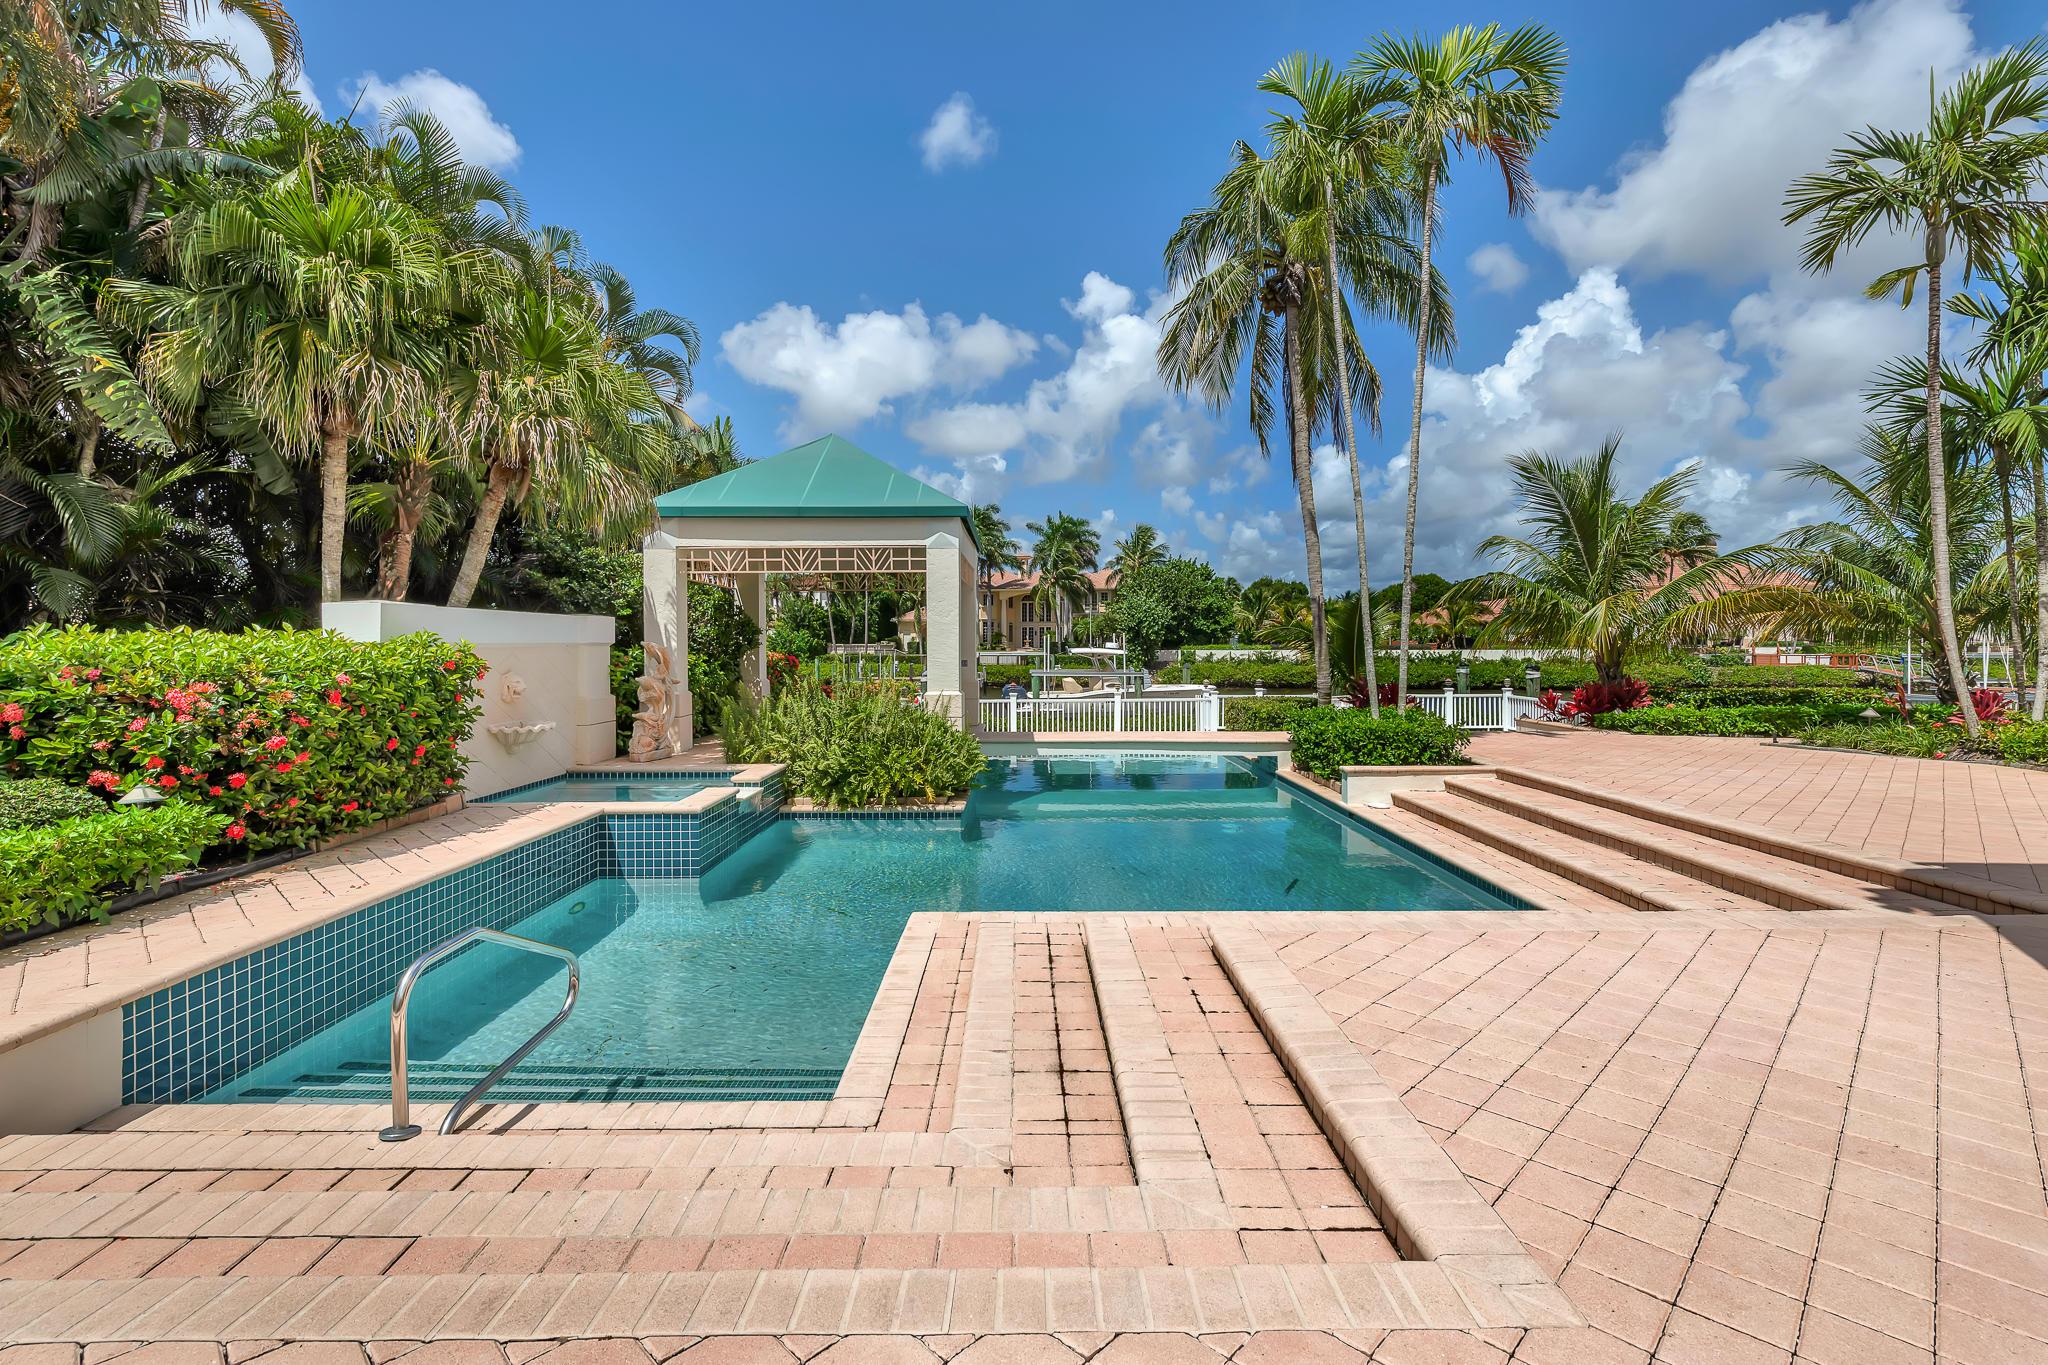 468 Mariner Drive, Jupiter, Florida 33477, 5 Bedrooms Bedrooms, ,5.2 BathroomsBathrooms,A,Single family,Mariner,RX-10462059